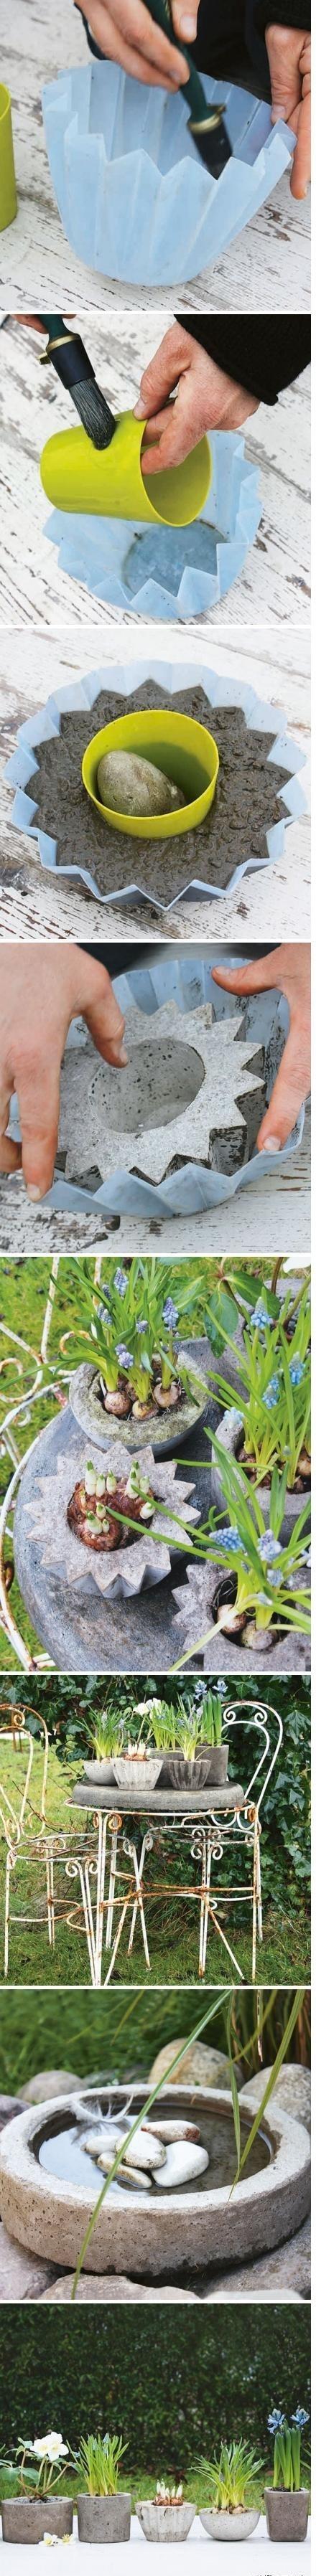 452 best Concrete images on Pinterest | Garden ideas, Cement and ...